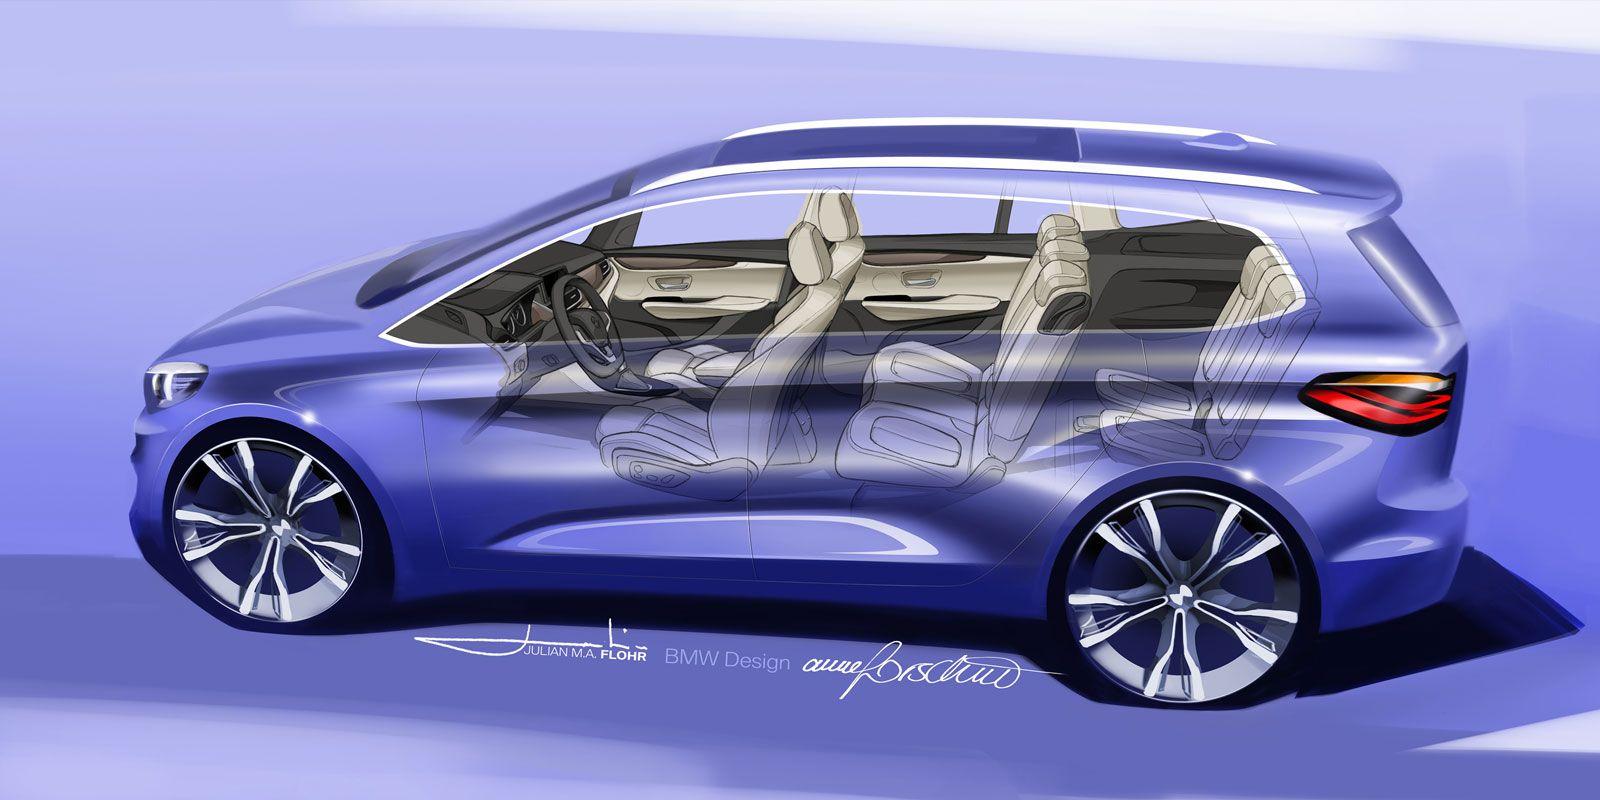 Bmw 2 Series Gran Tourer Seethrough Design Sketch With Images